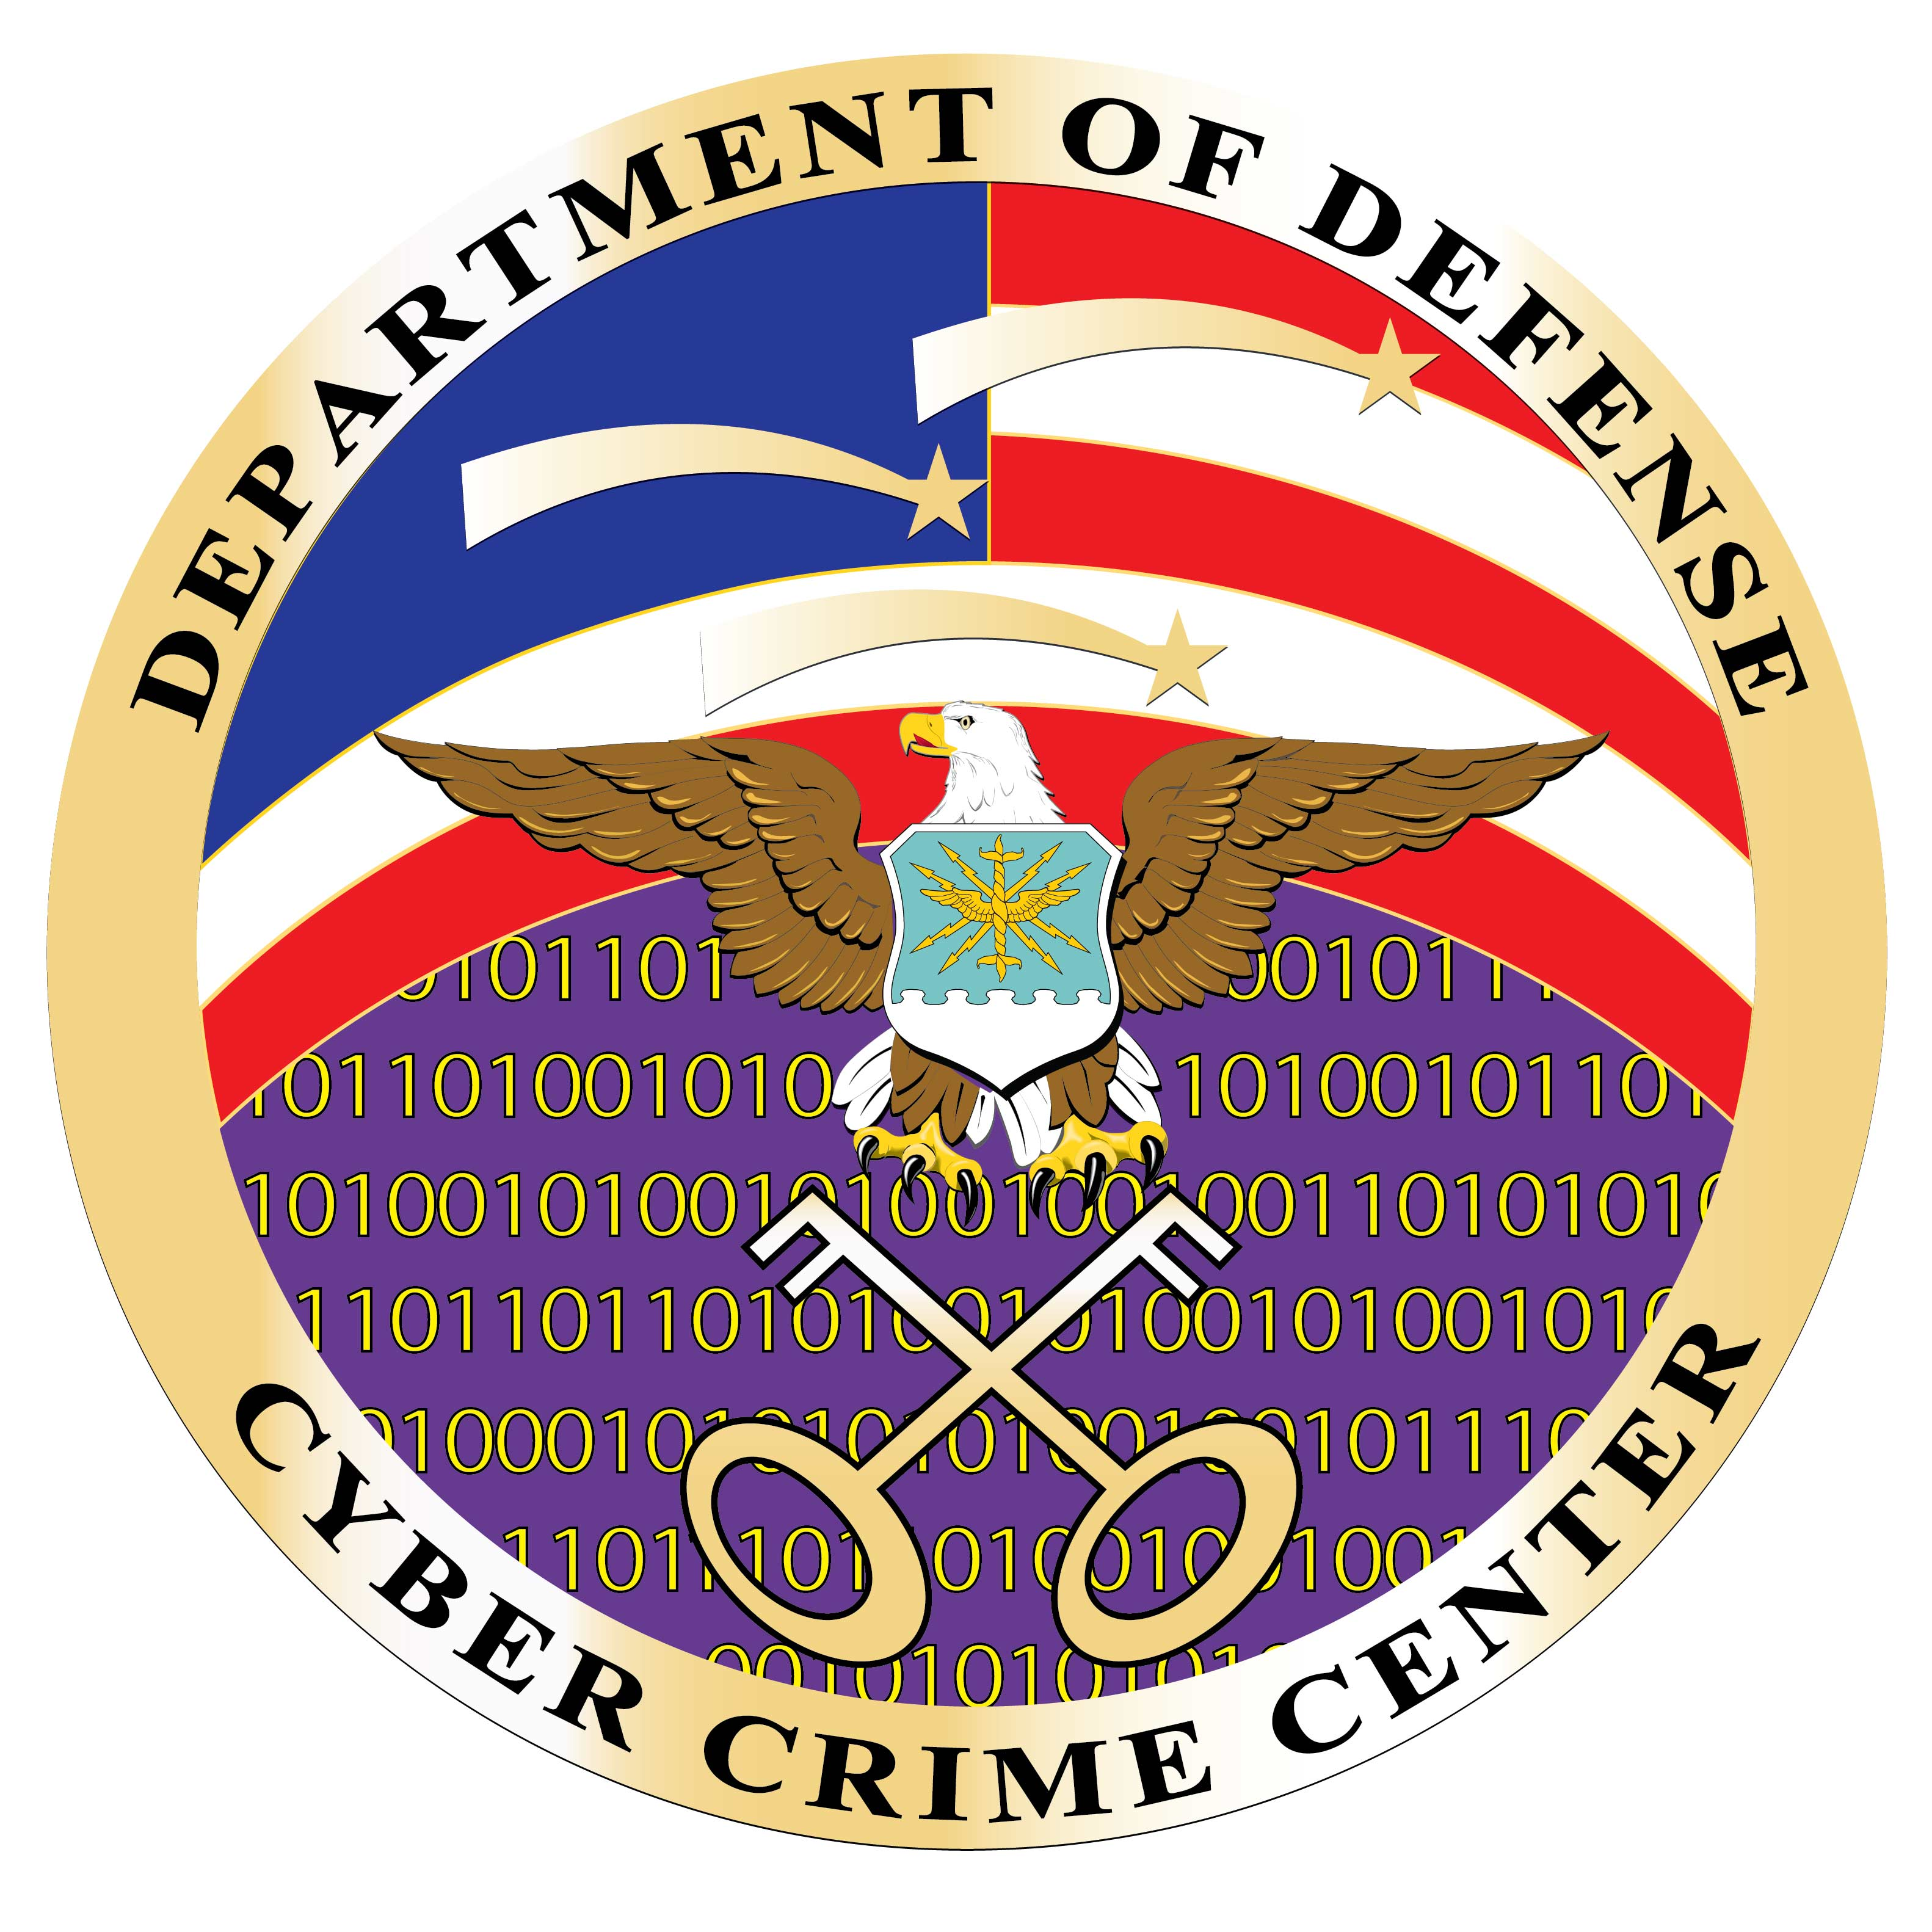 Department of Defense Cyber Crime Center - Wikipedia